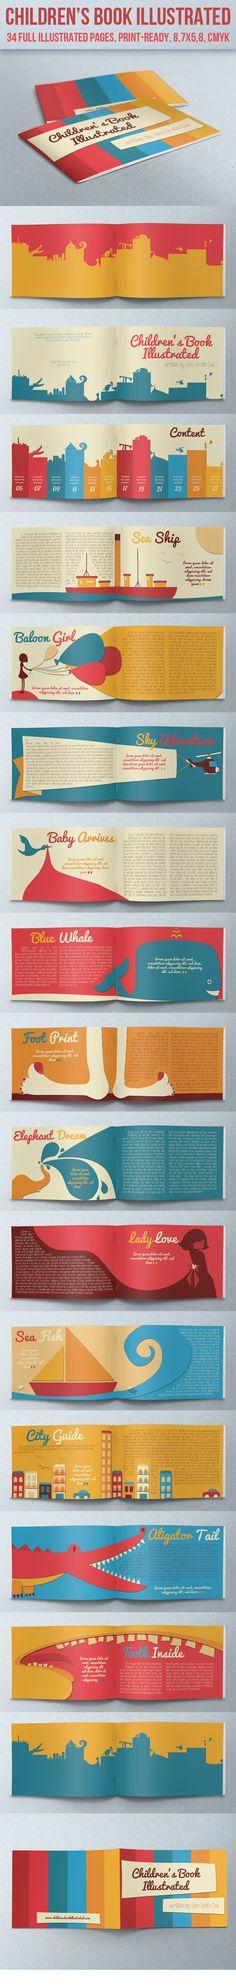 Children's Book Illustrated by crew55design , via Behance